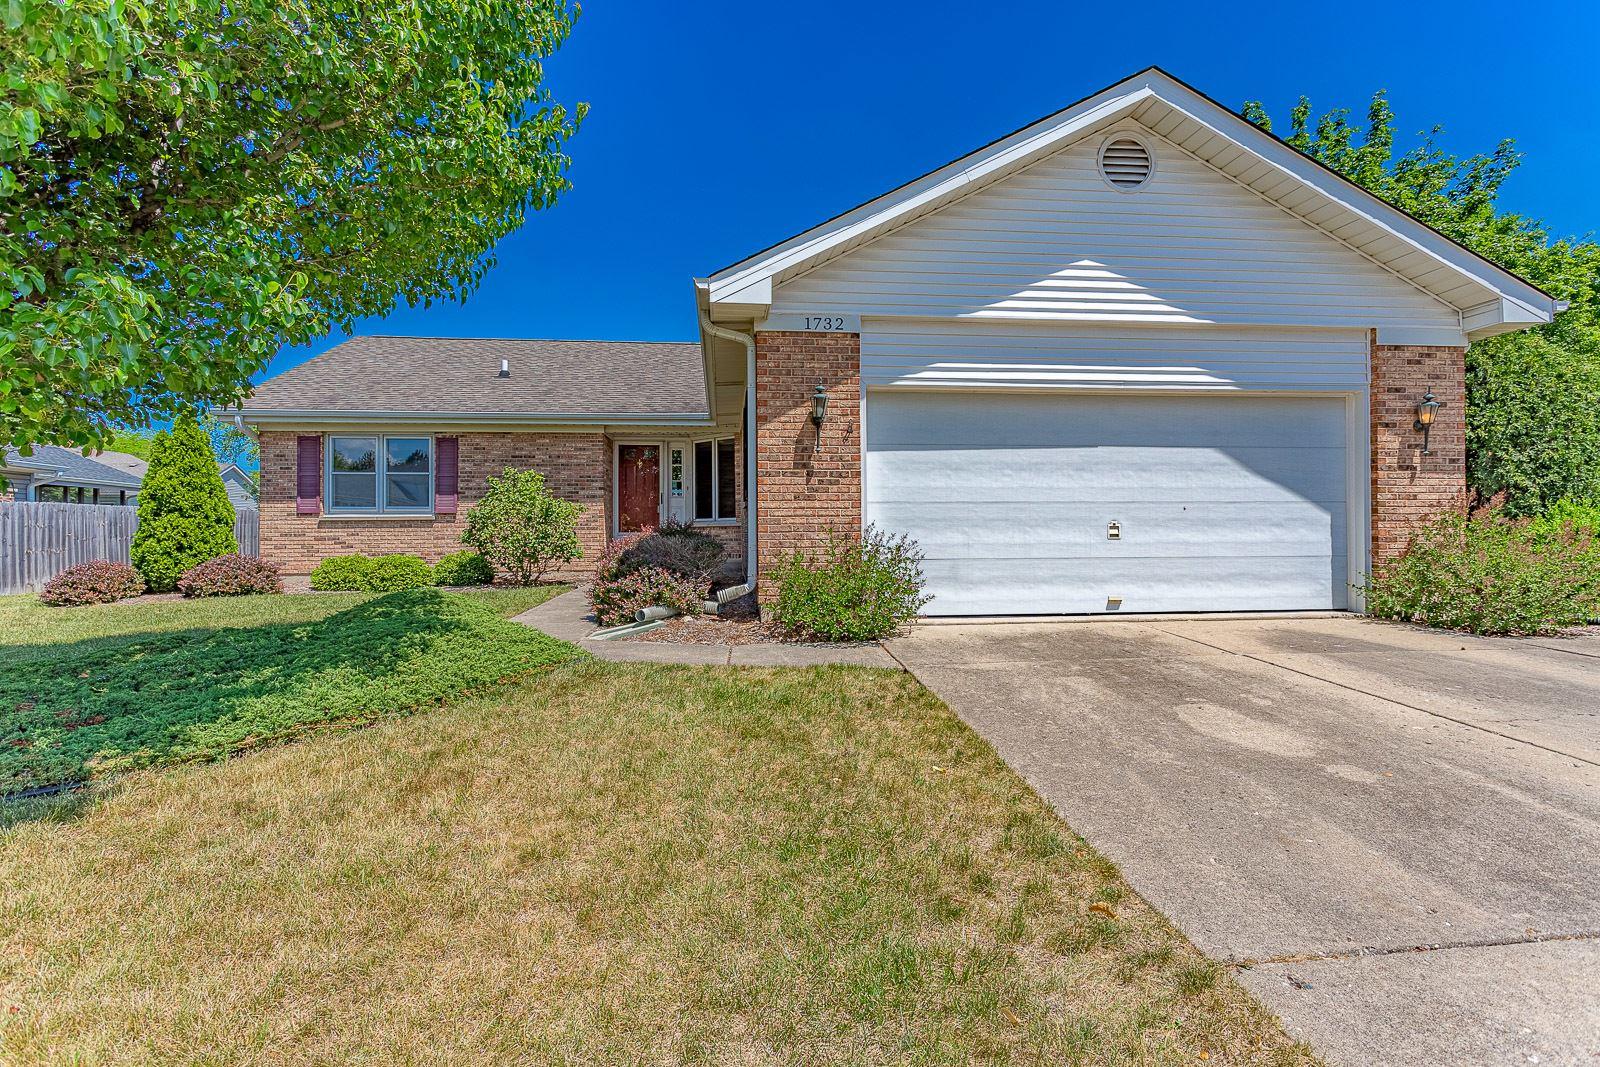 1732 Roosa Lane, Elk Grove Village, IL 60007 - #: 11074532